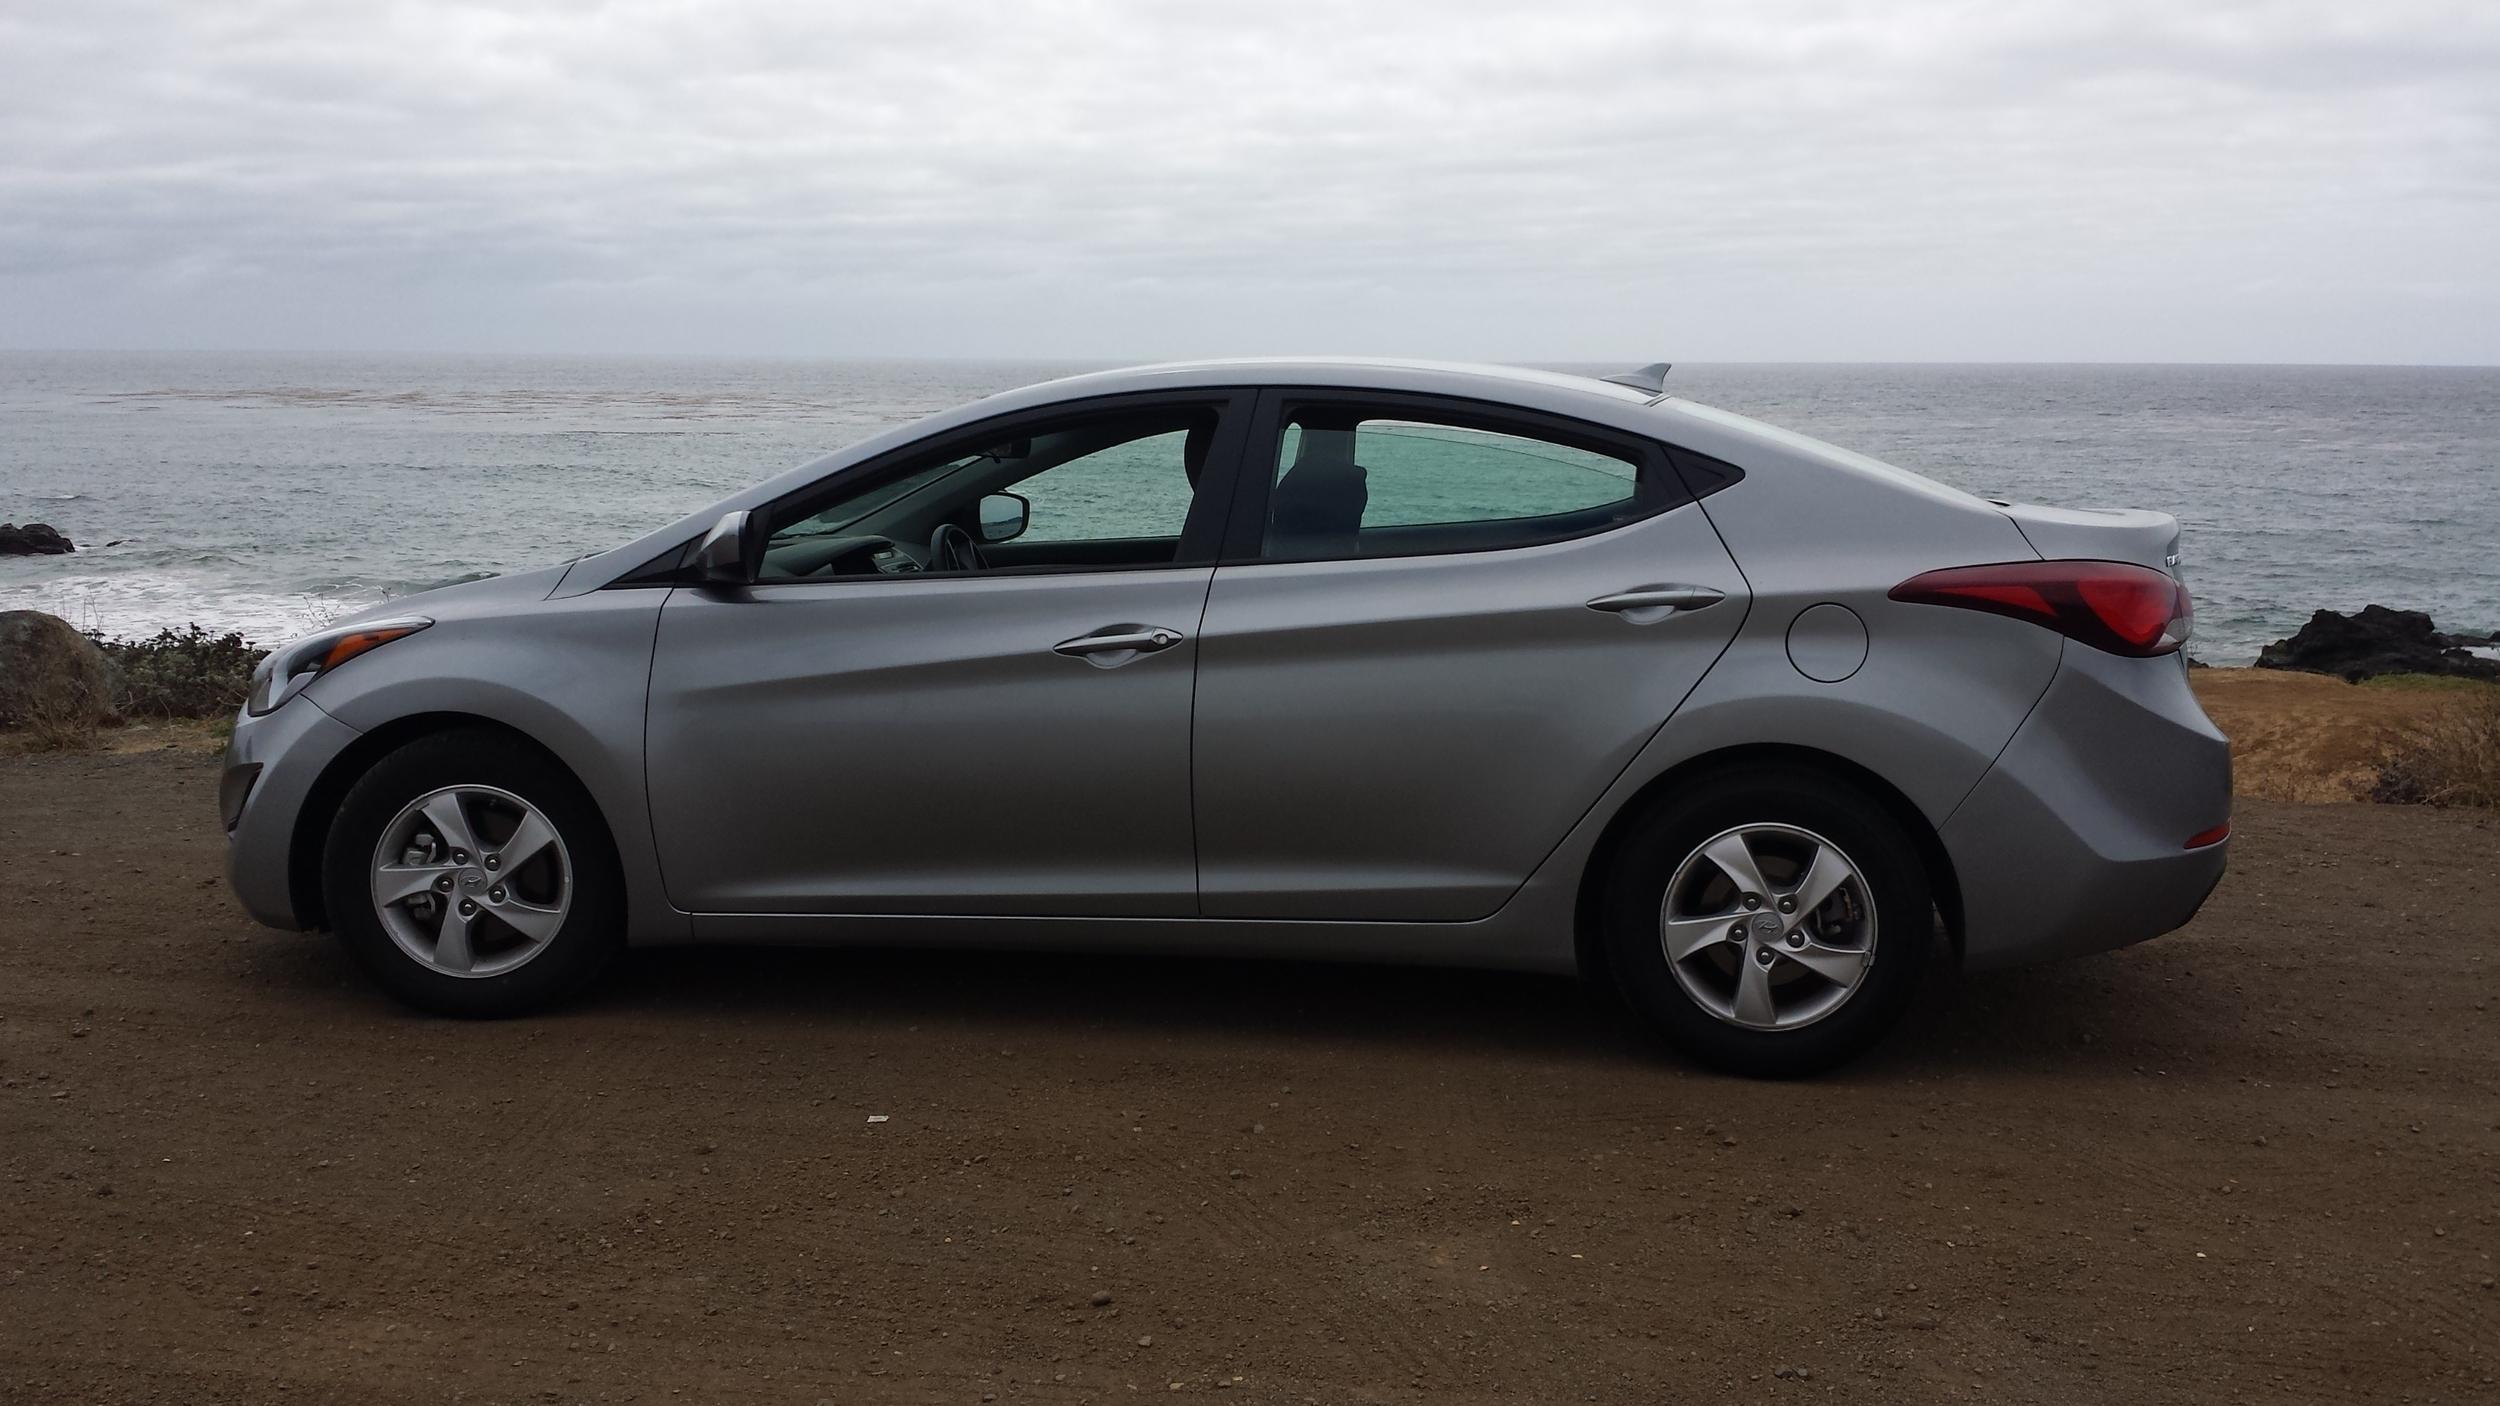 Goodbye to my sweet ride and fantastic gas mileage. Hyundai Elantra